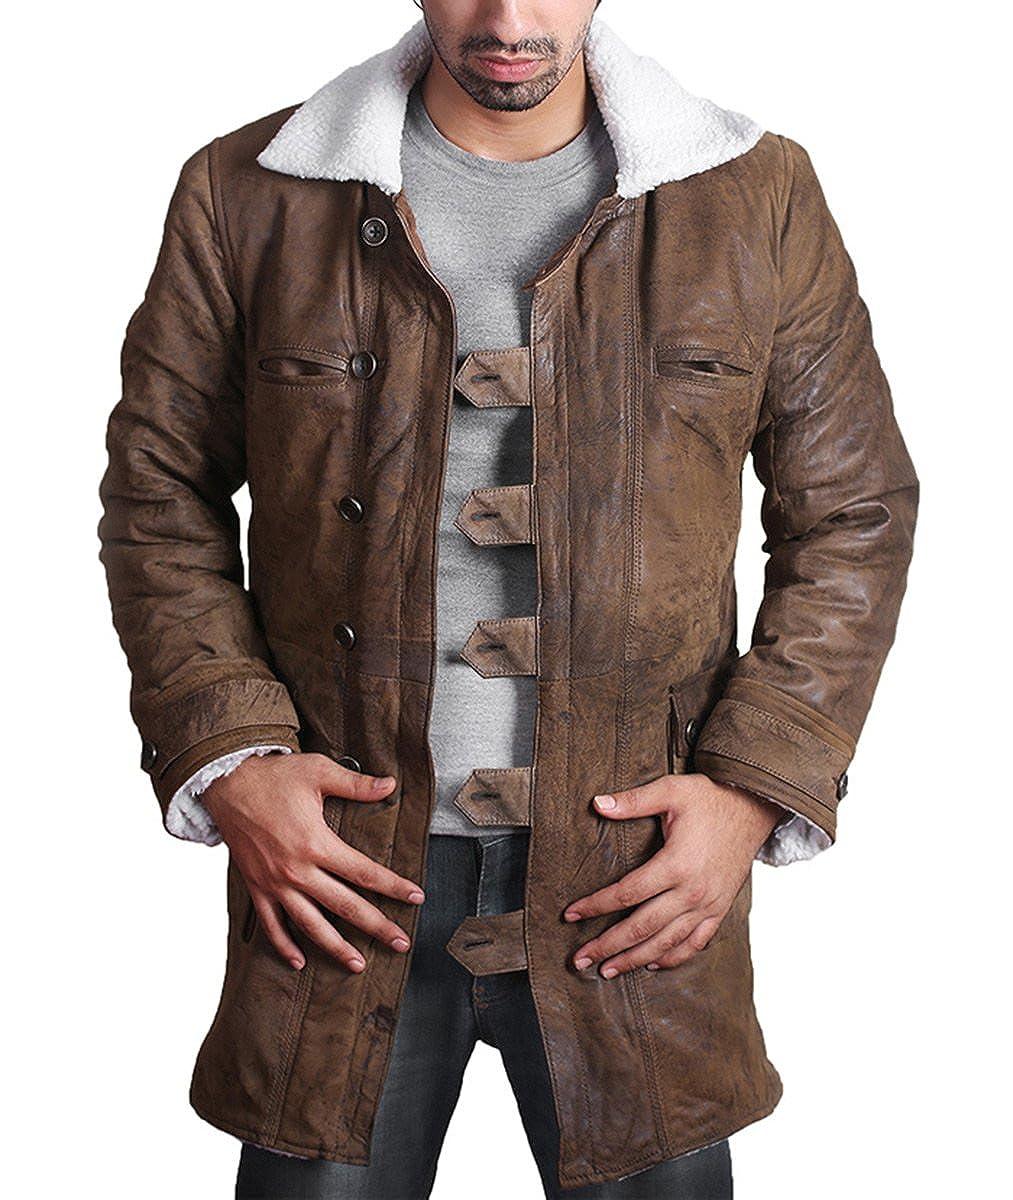 Bane Coat 'Tom Hardy - Dark Knight Rises' Vintage Distressed Look Leather Jacket us-banecr-p